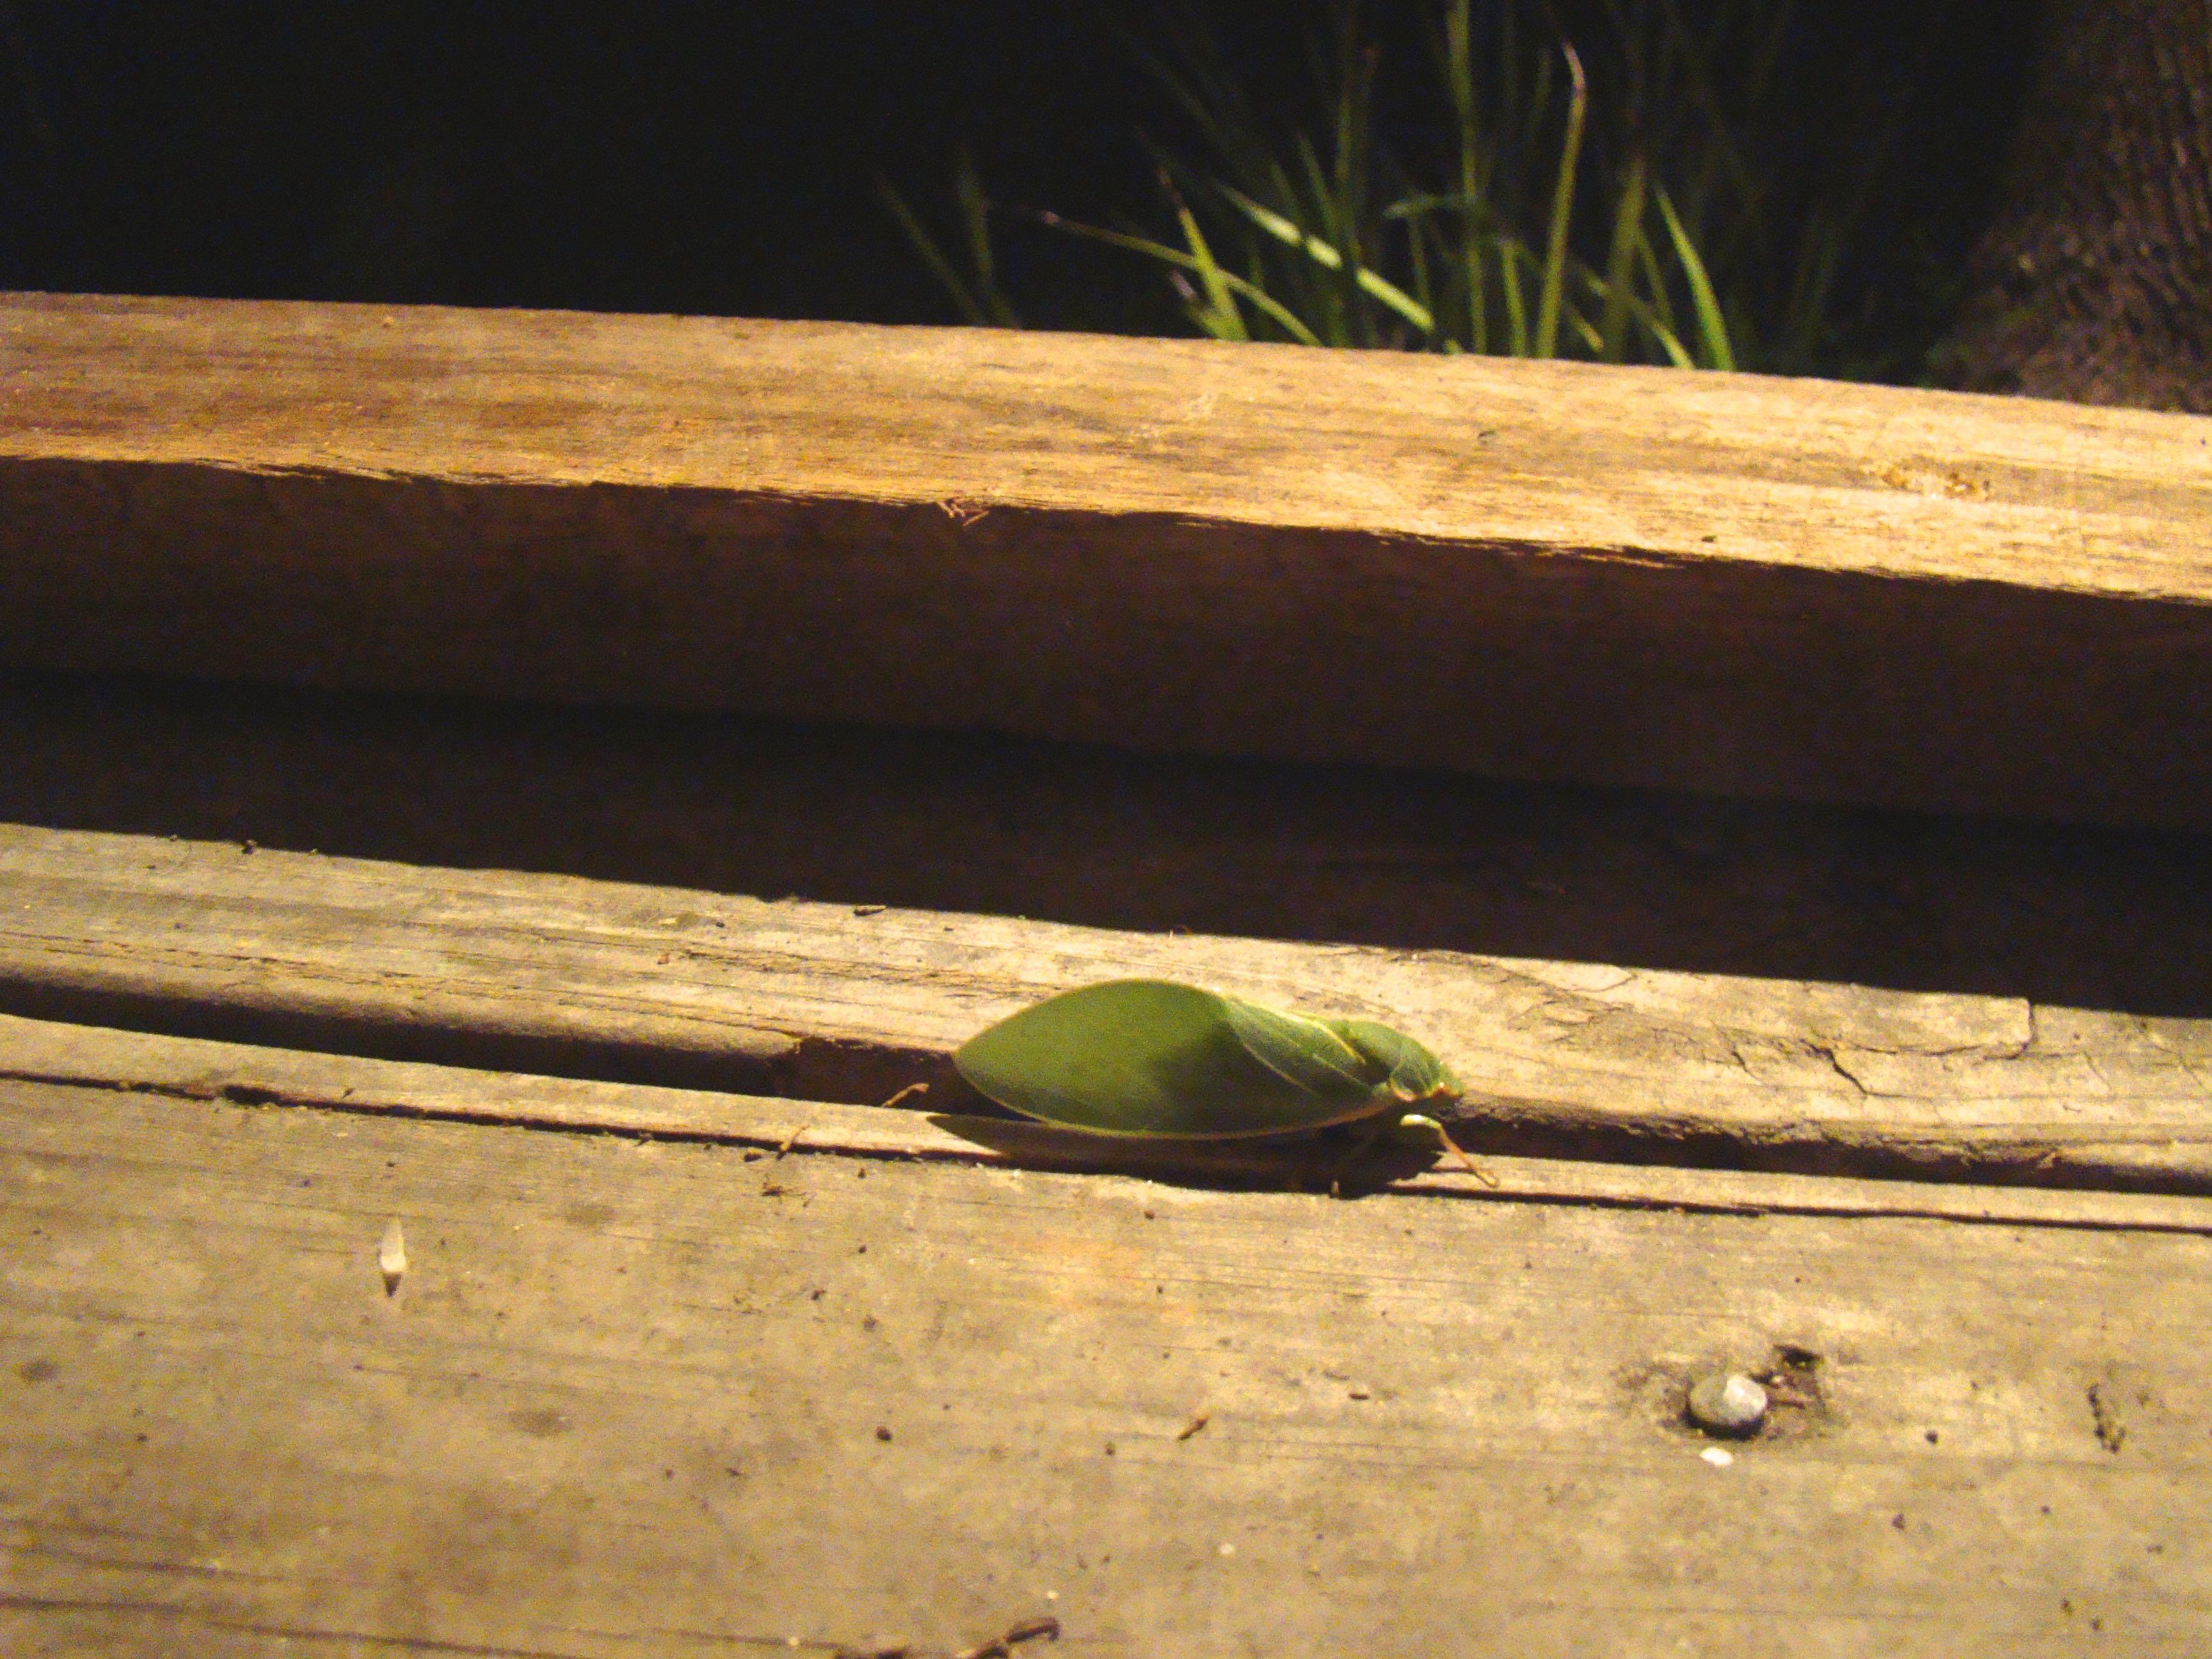 Lesser Bottle Cikada, (Chlorocysta vitripennis)